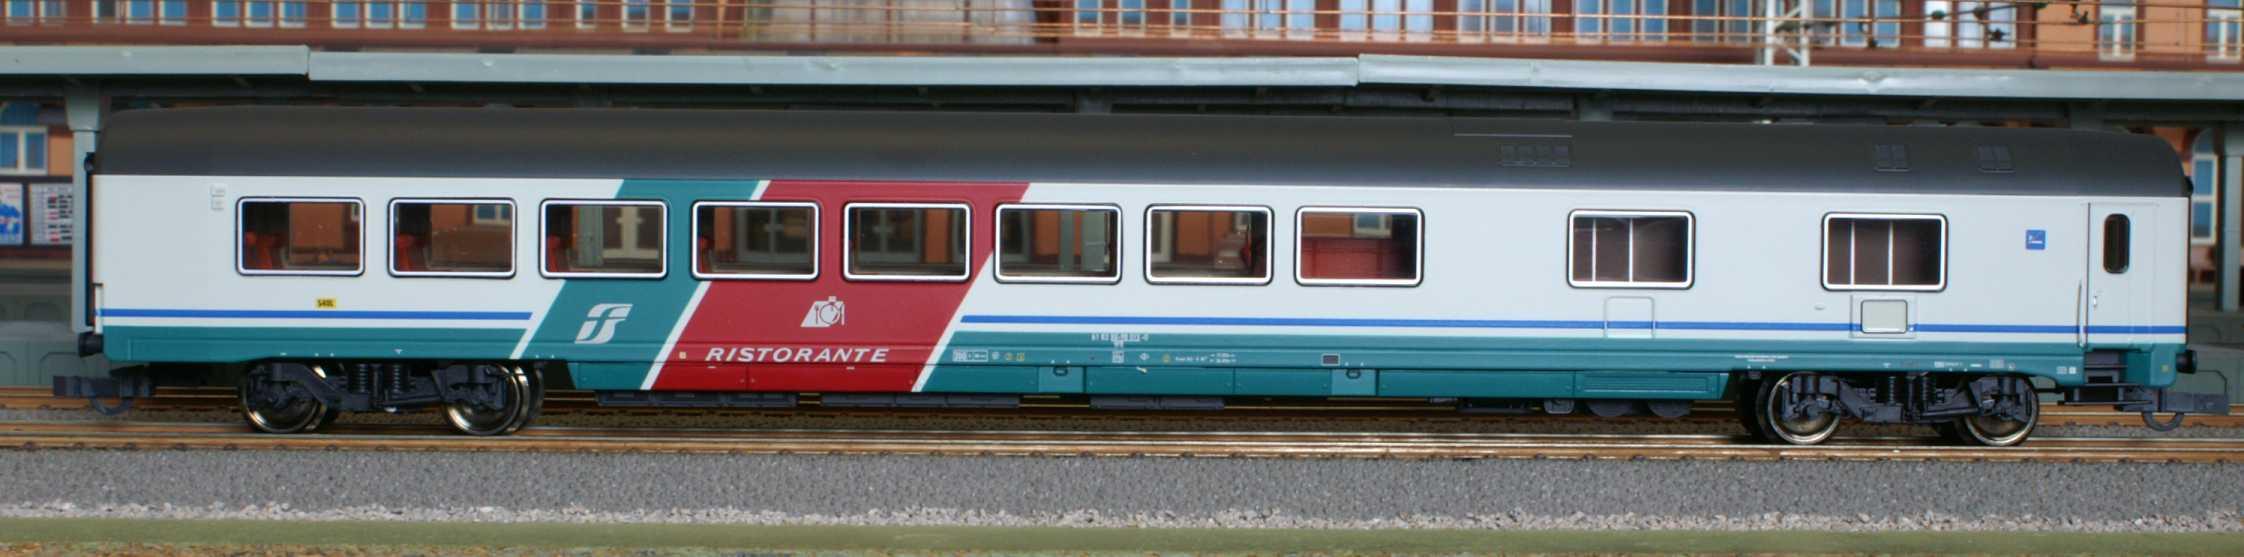 Roco 45628 - FS WR in neuer Farbgebung, grauweiss-tuerkis, Dach grau.1